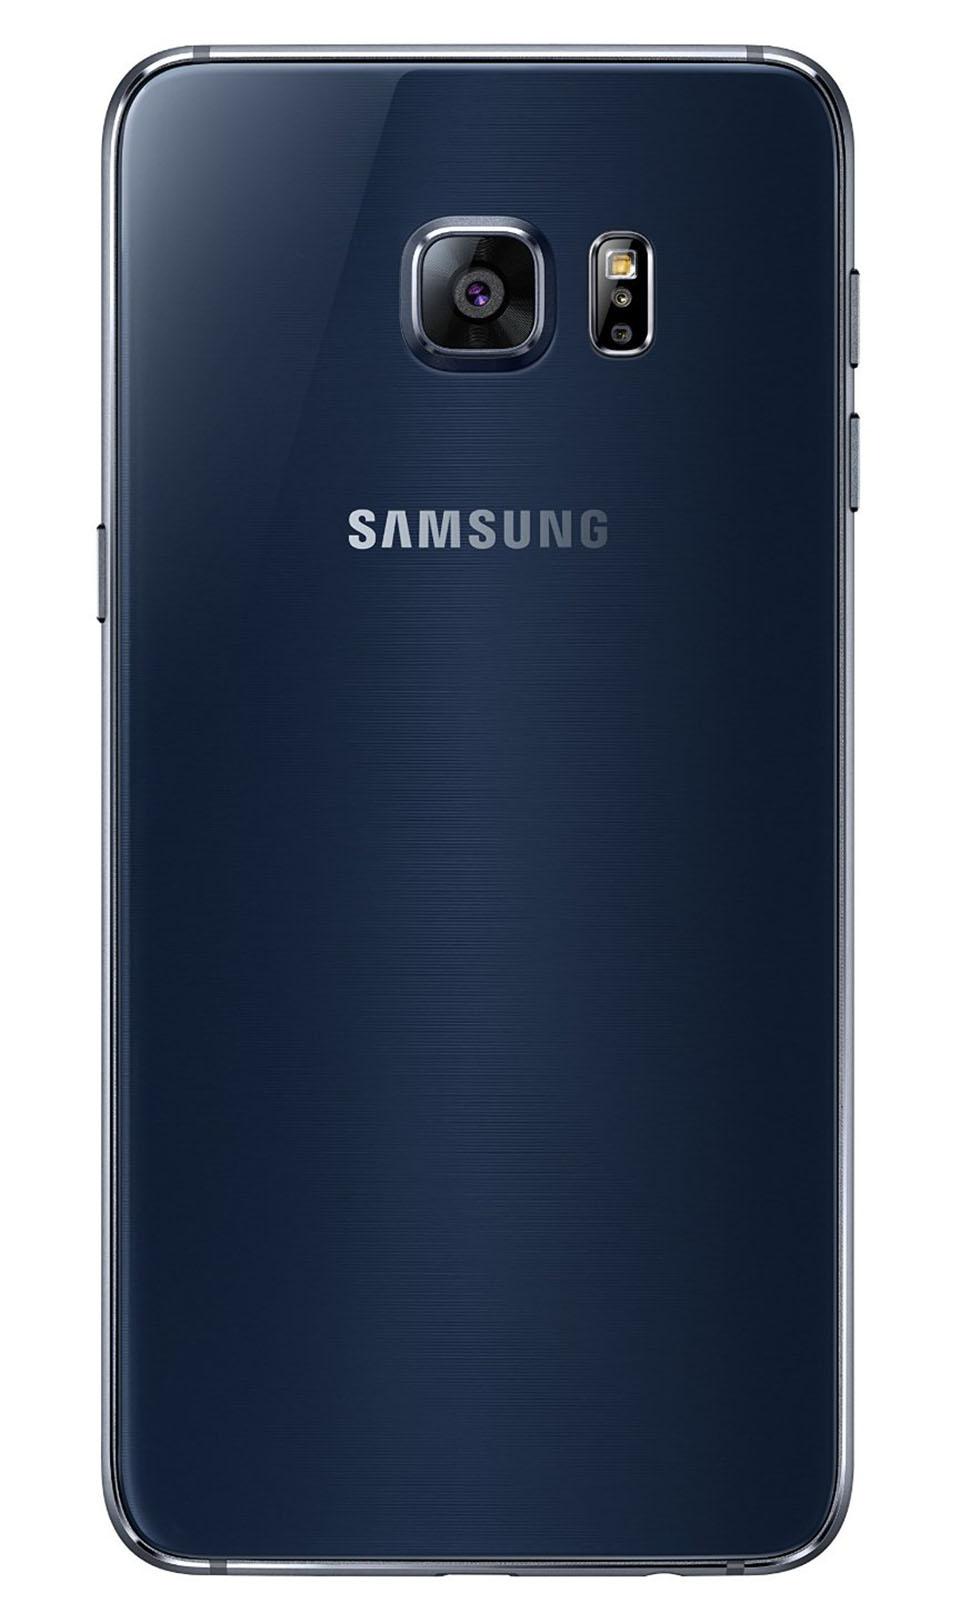 Смартфон Samsung GALAXY S6 Edge, 32GB, Gold - ugra.ru